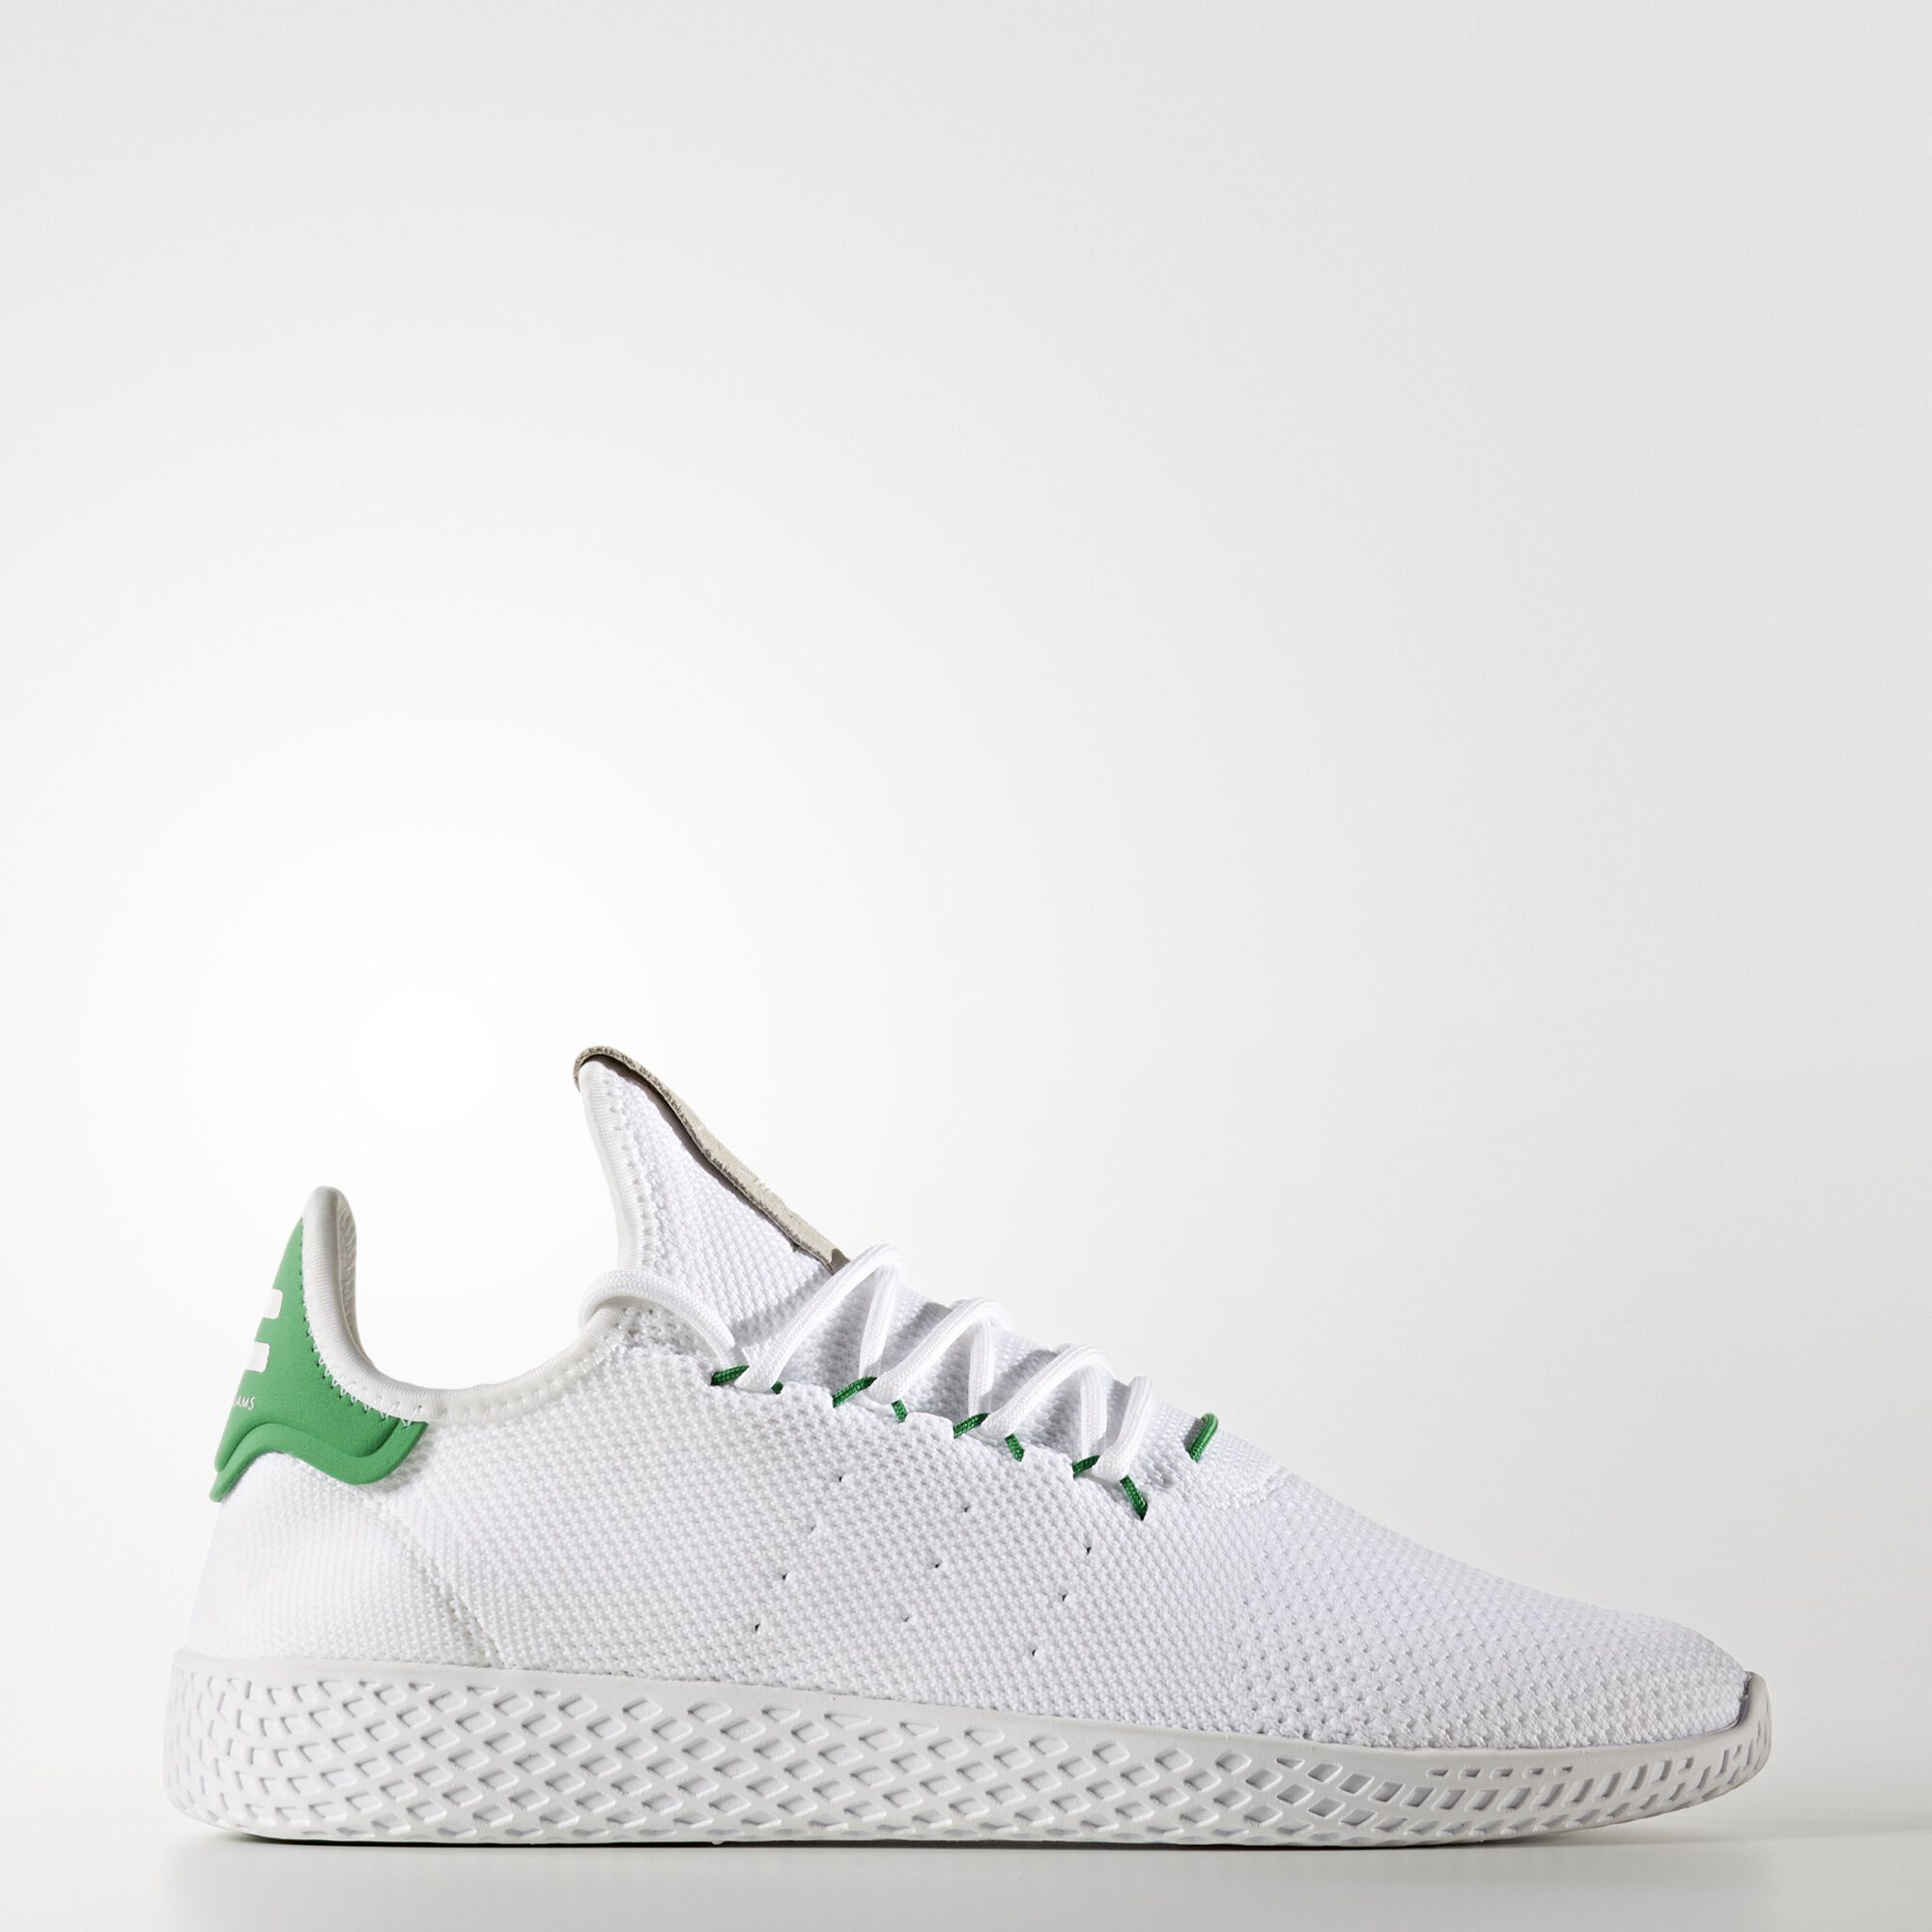 BAPE x Cheap Adidas NMD Cheap Adidas Originals NMD